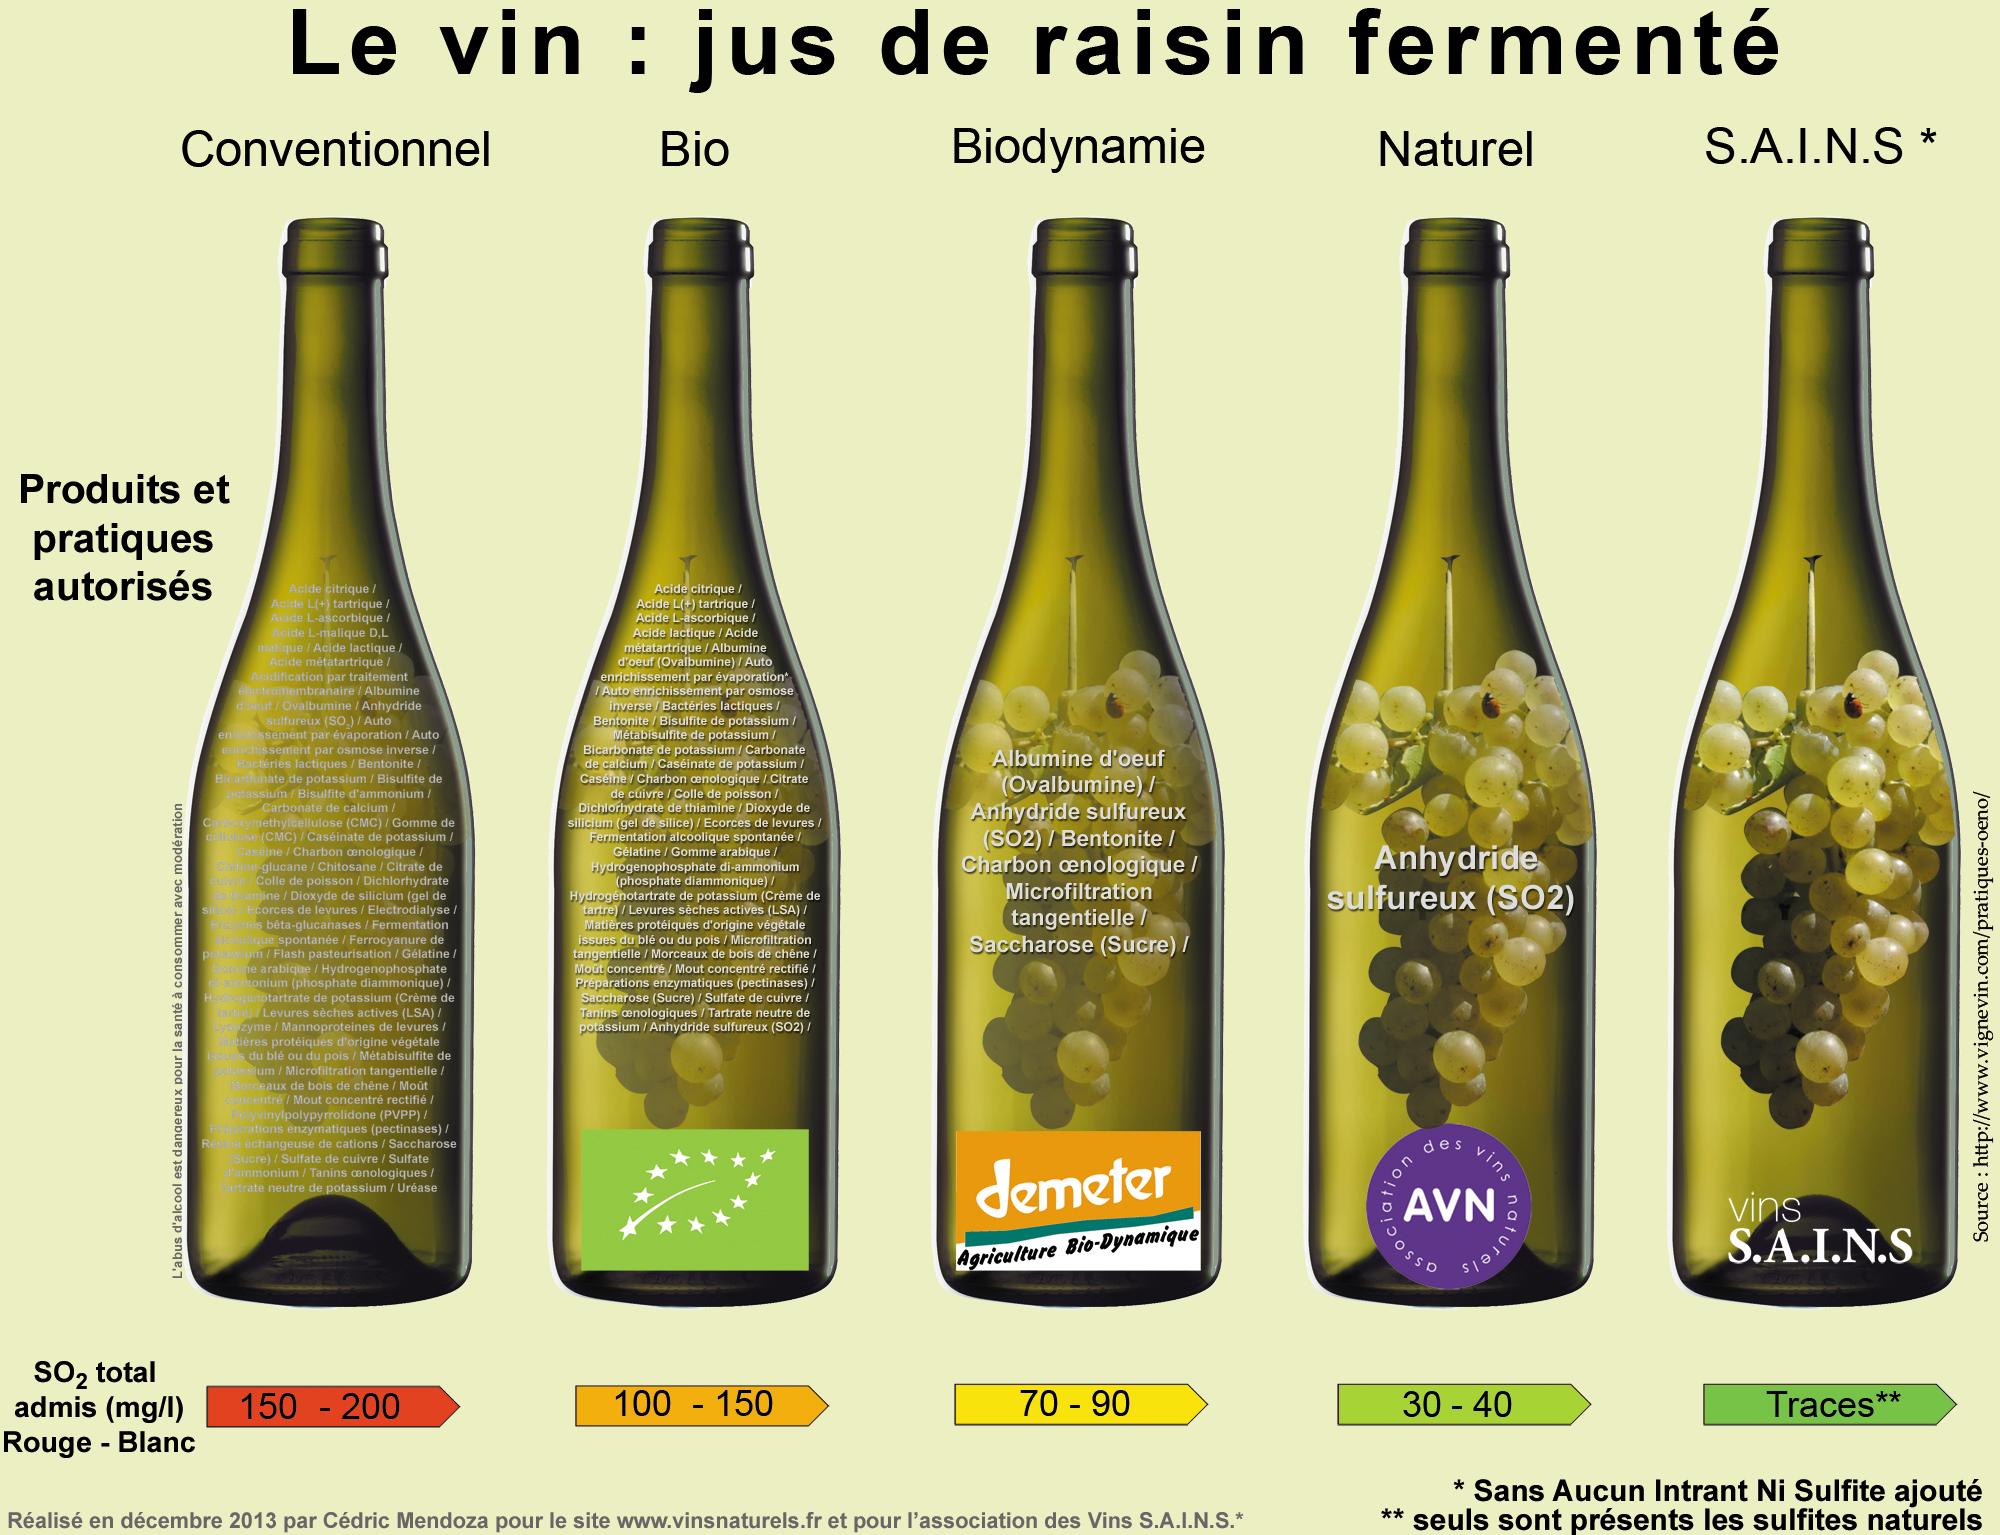 Certifications vins biologiques, biodynamie, vin nature, vin SAINS, vin bio